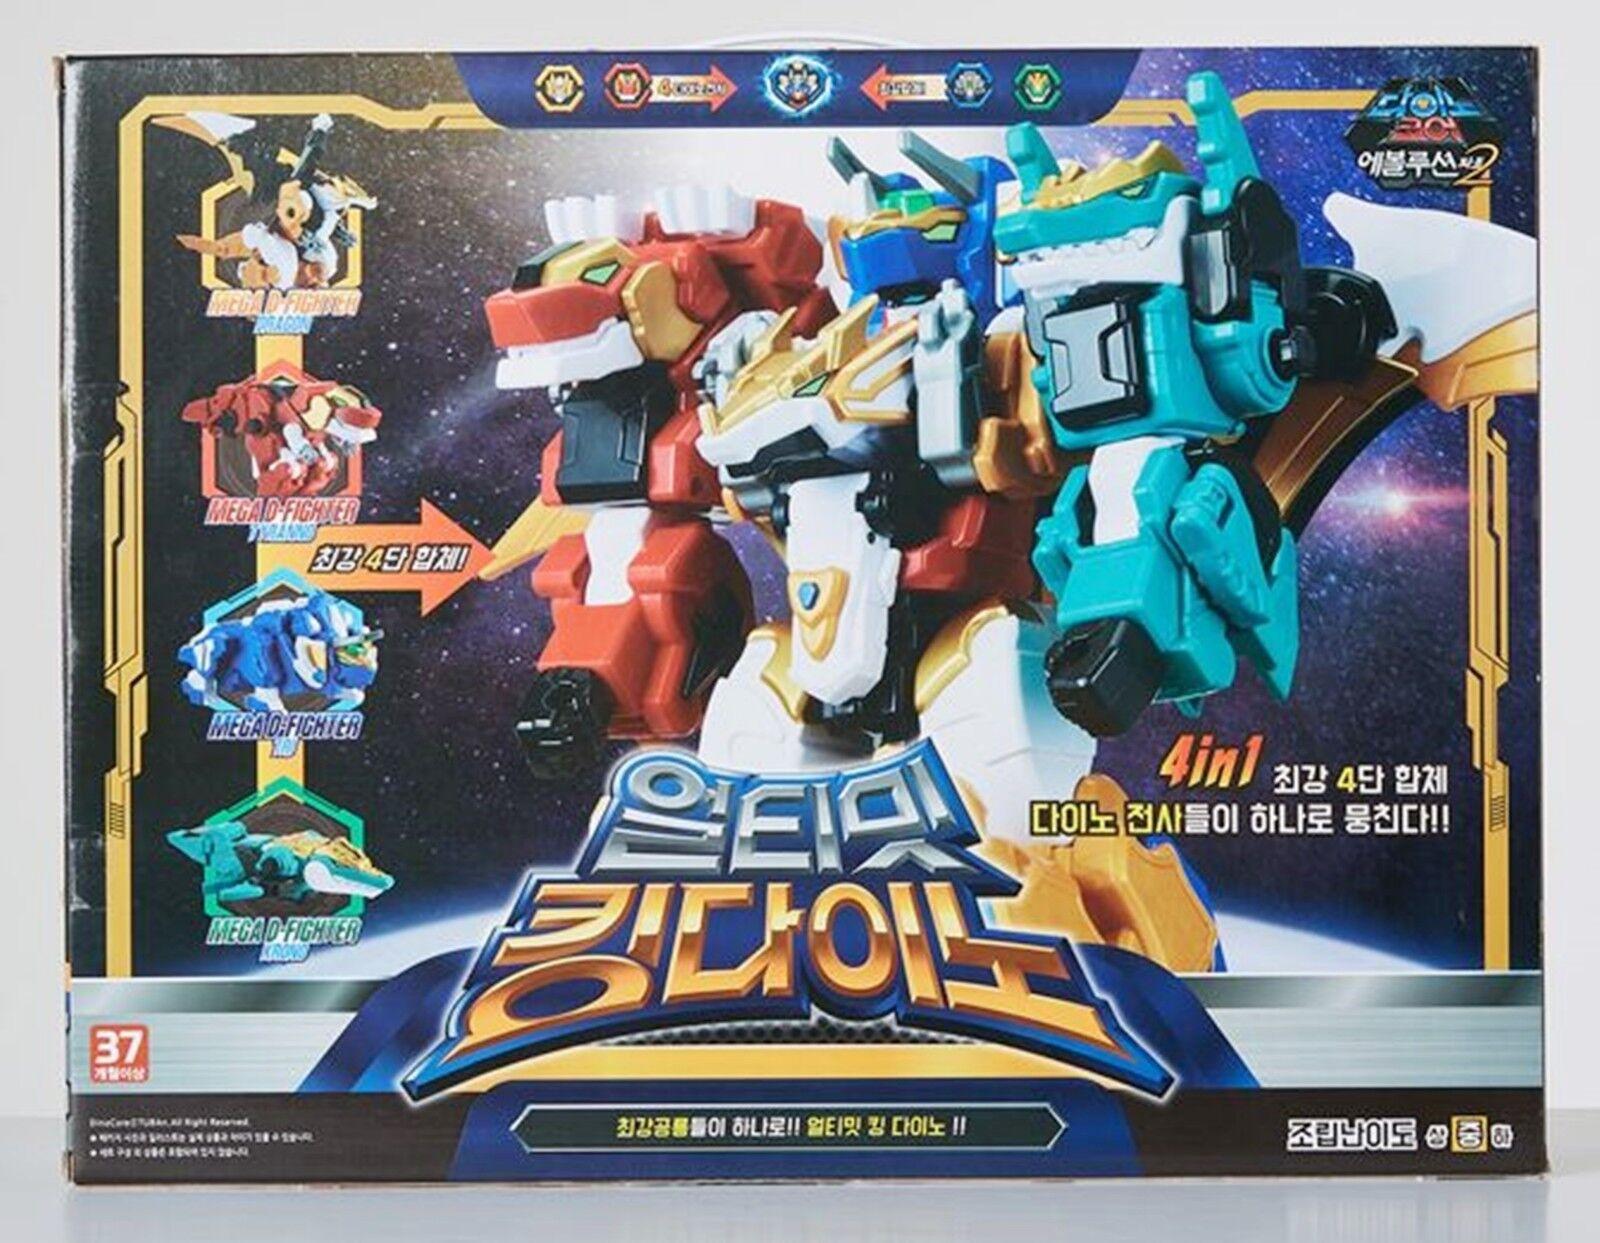 Dino Core Evolution 2 ULTIMATE KING DINO Mega D-Fighter Transformer Robot 4 IN 1